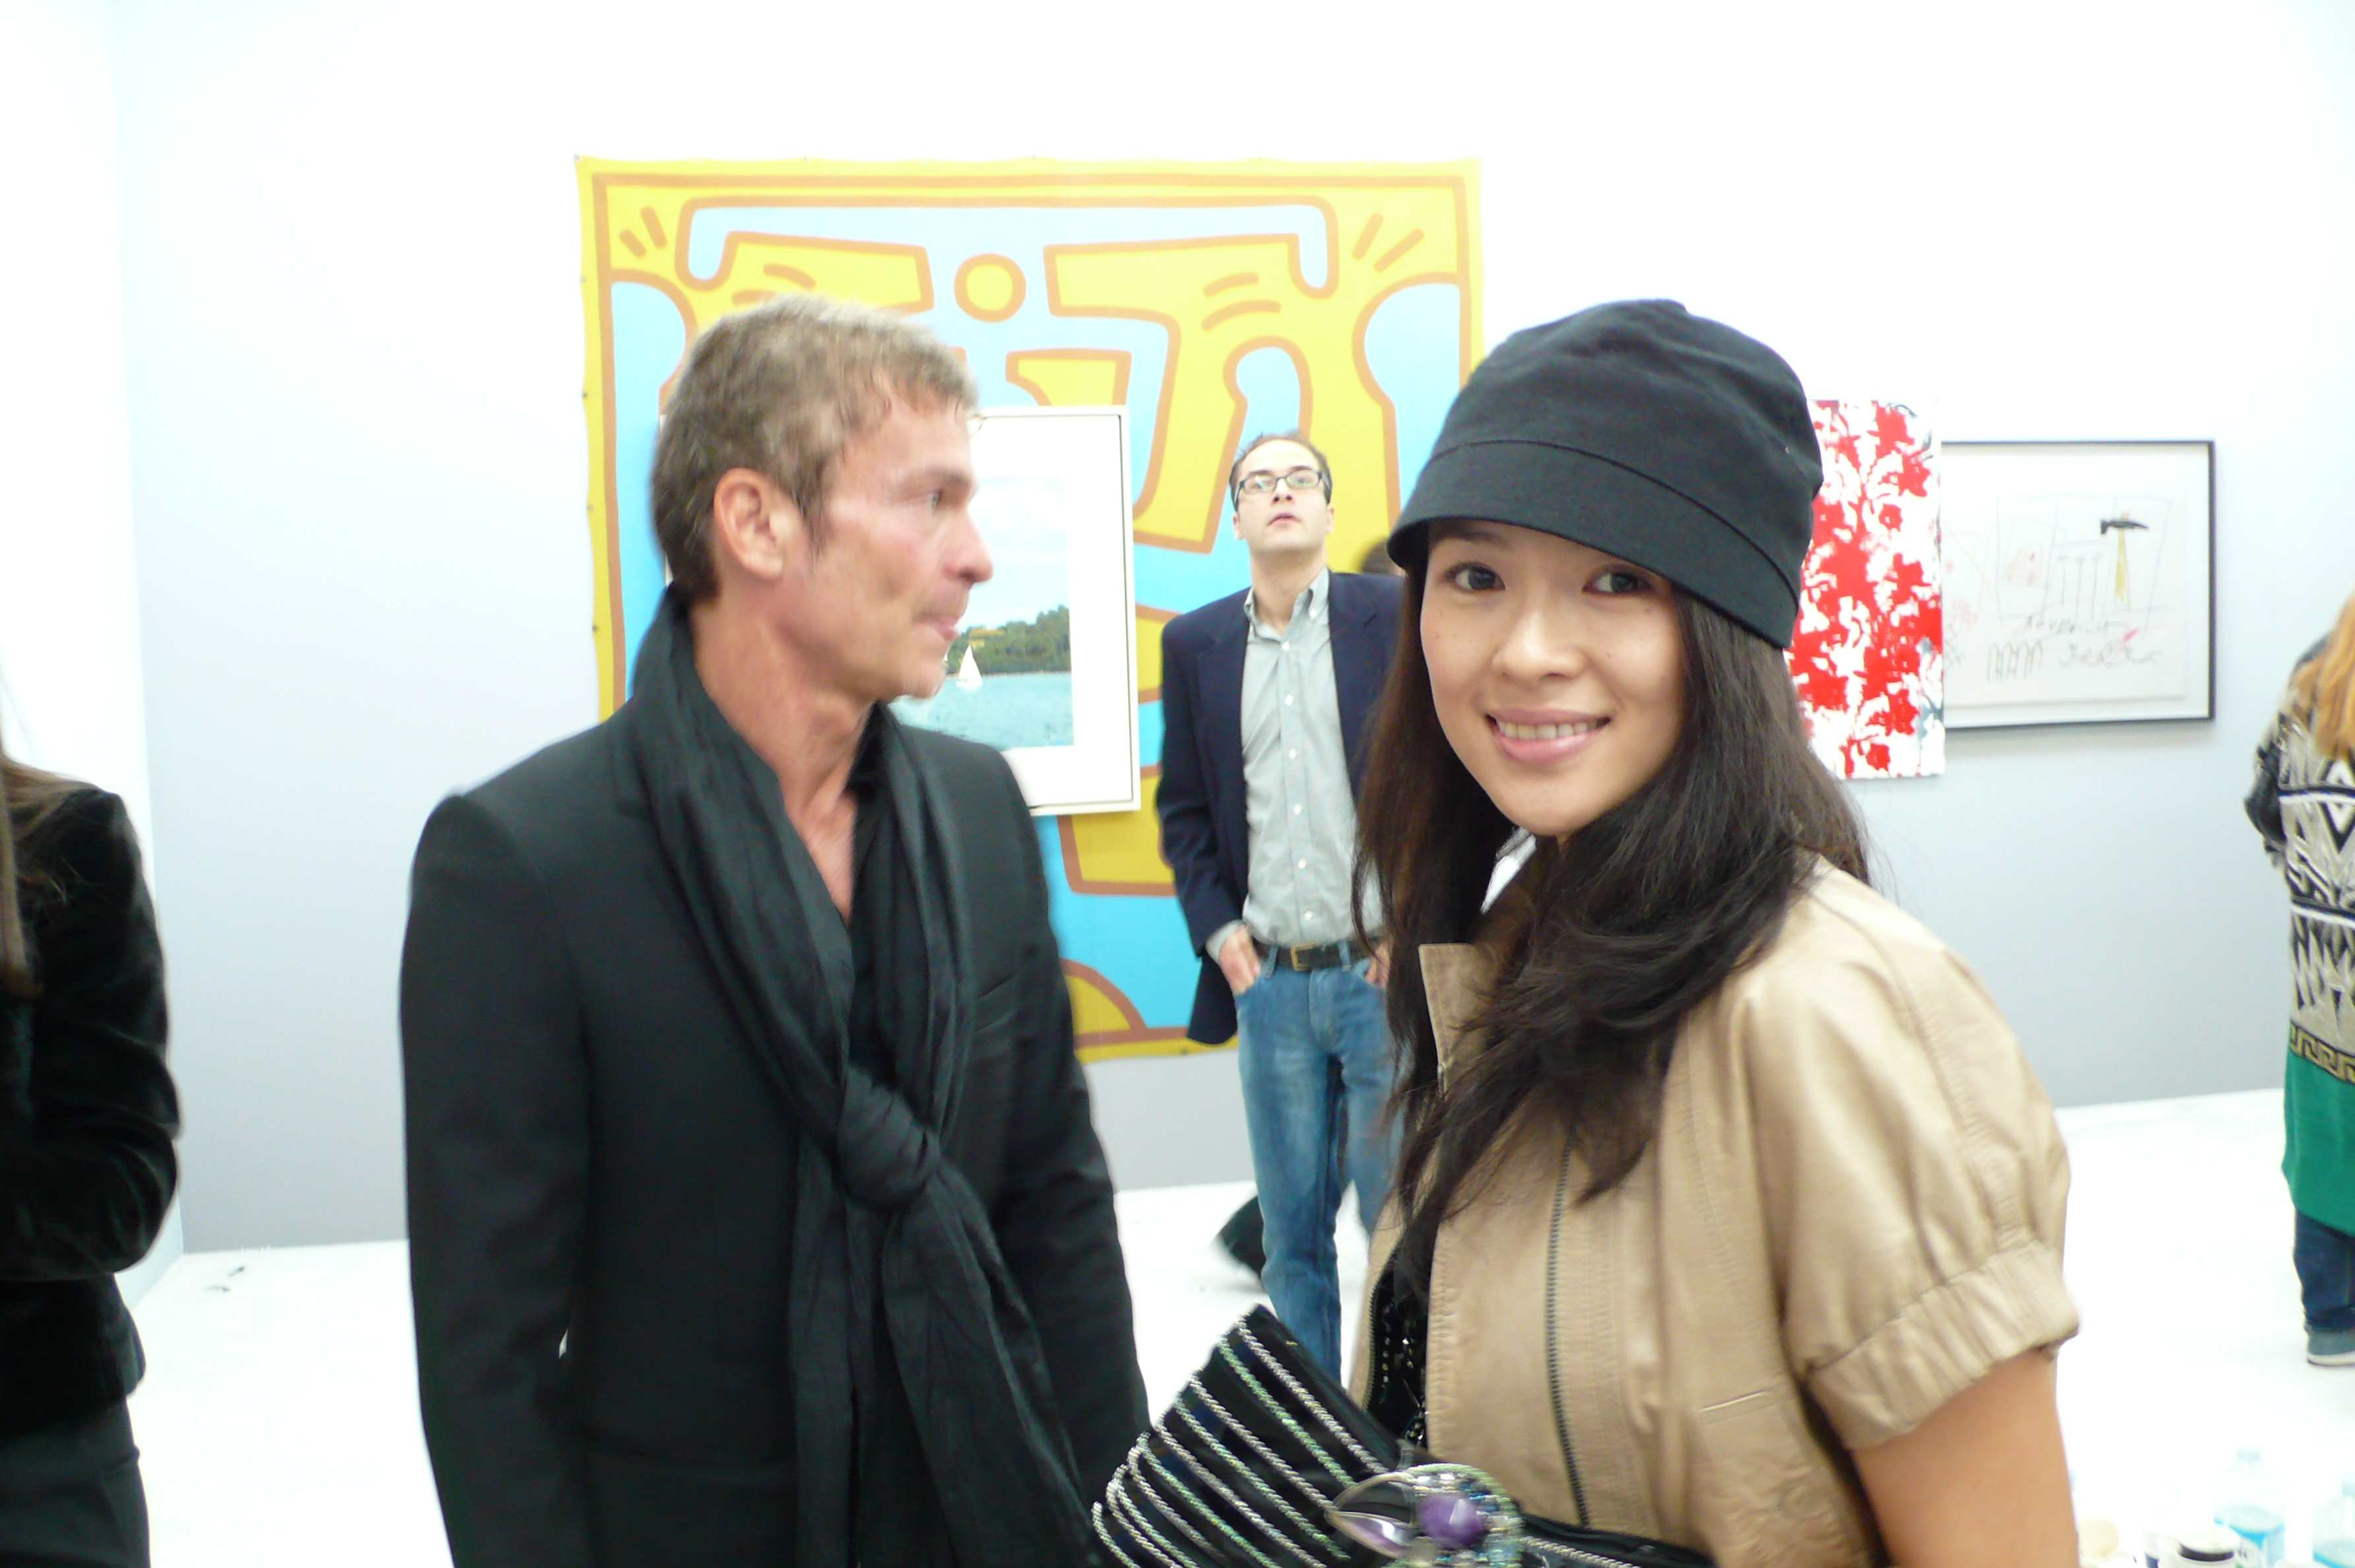 Zhang Ziyi via Art Observed